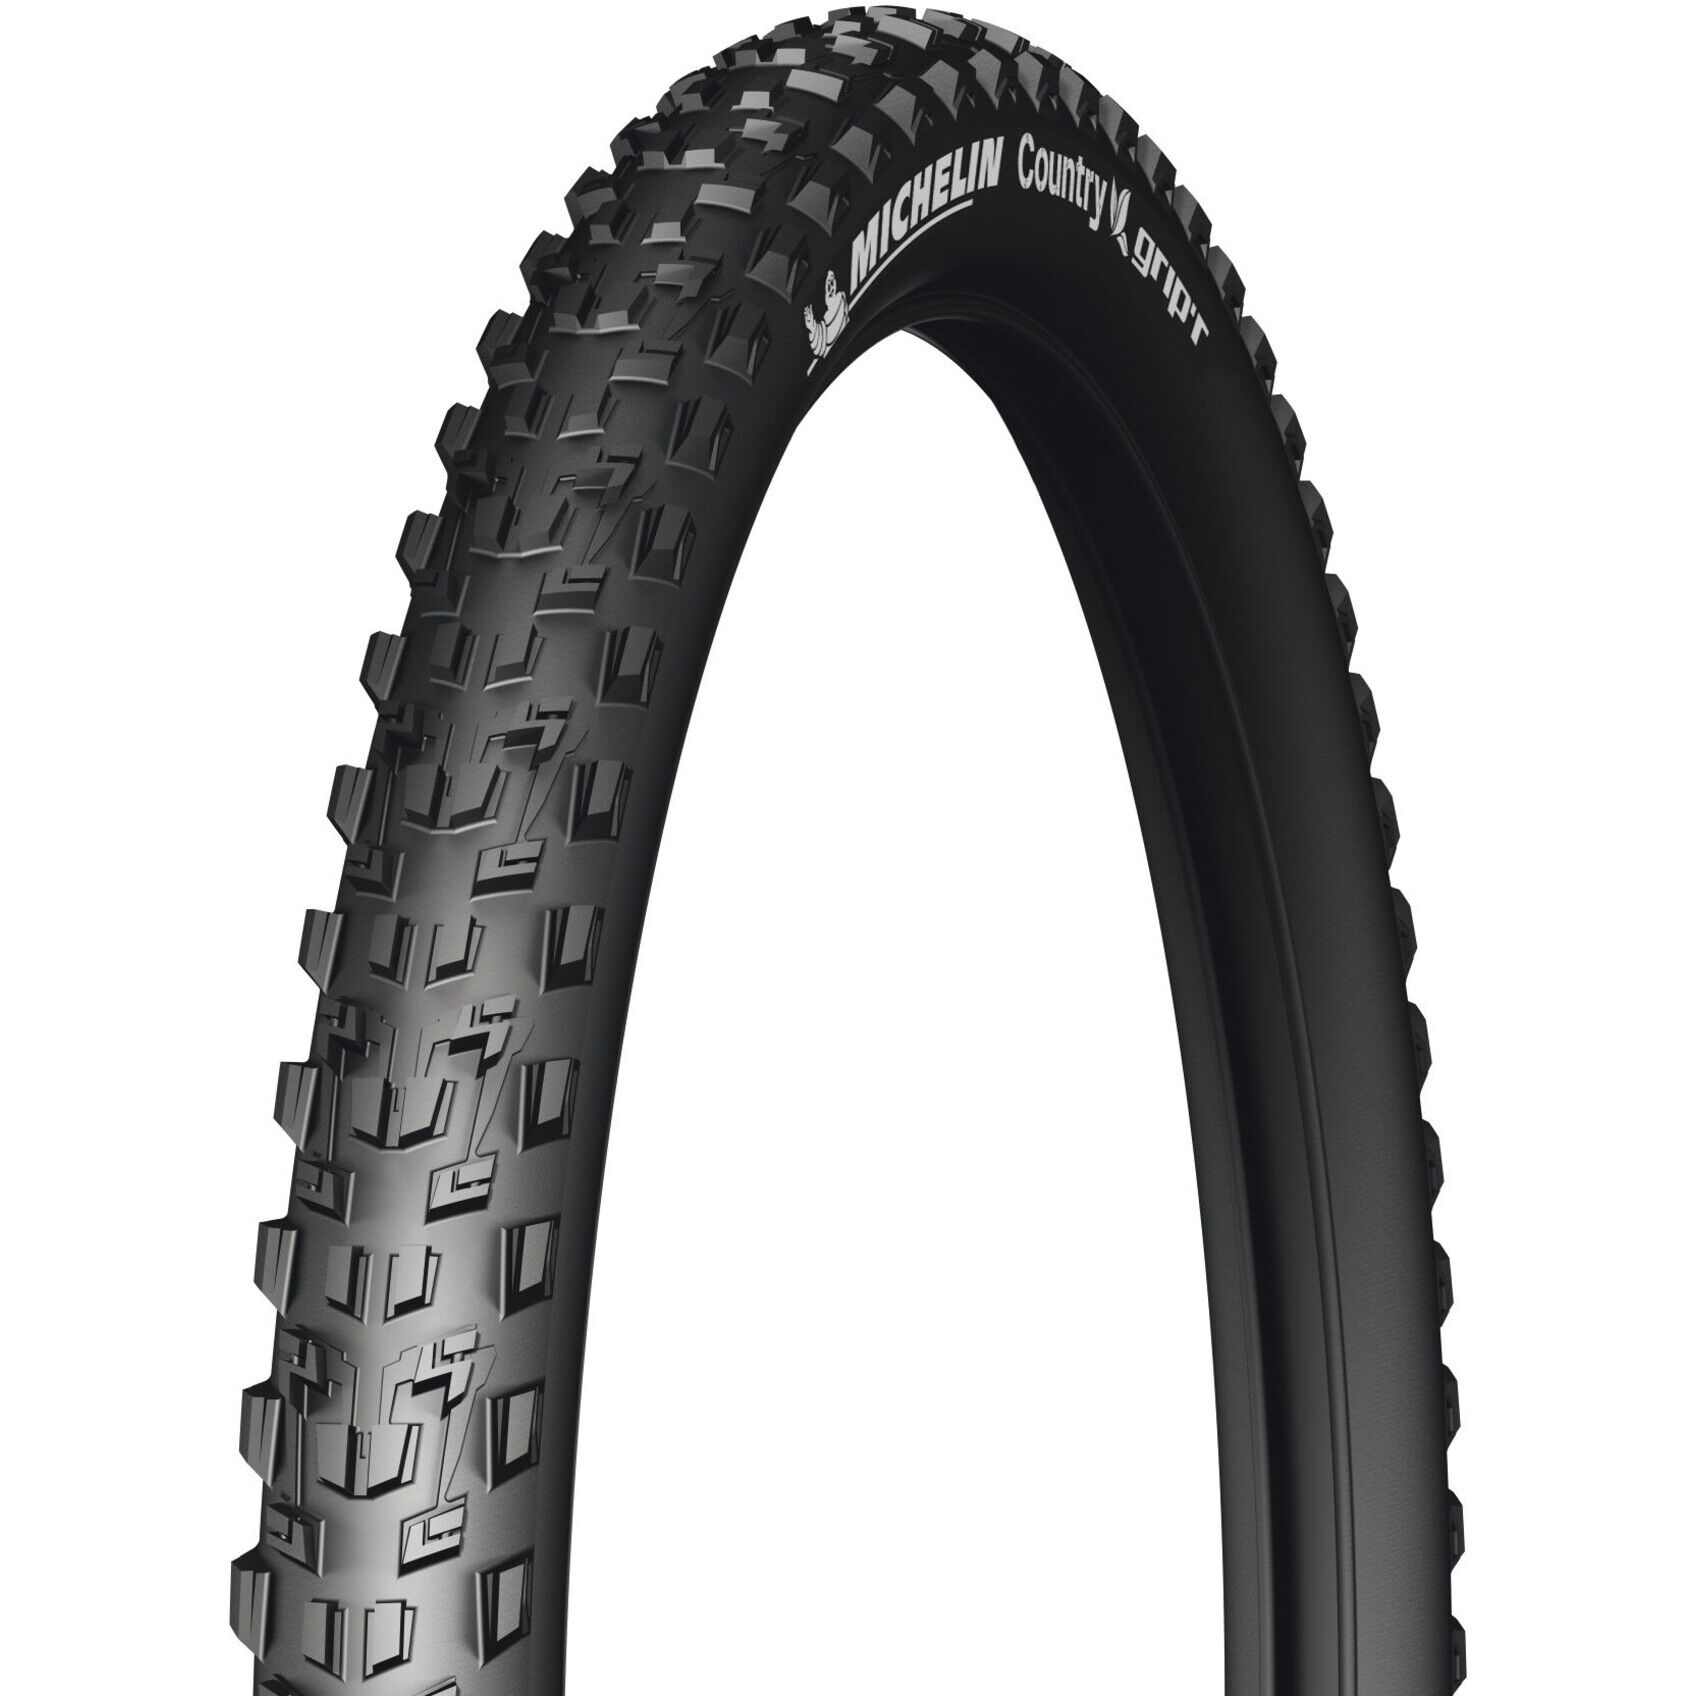 "Michelin Fahrrad Reifen Fahrradreifen Country AT Draht 26/"" 26x2.00 52-559"